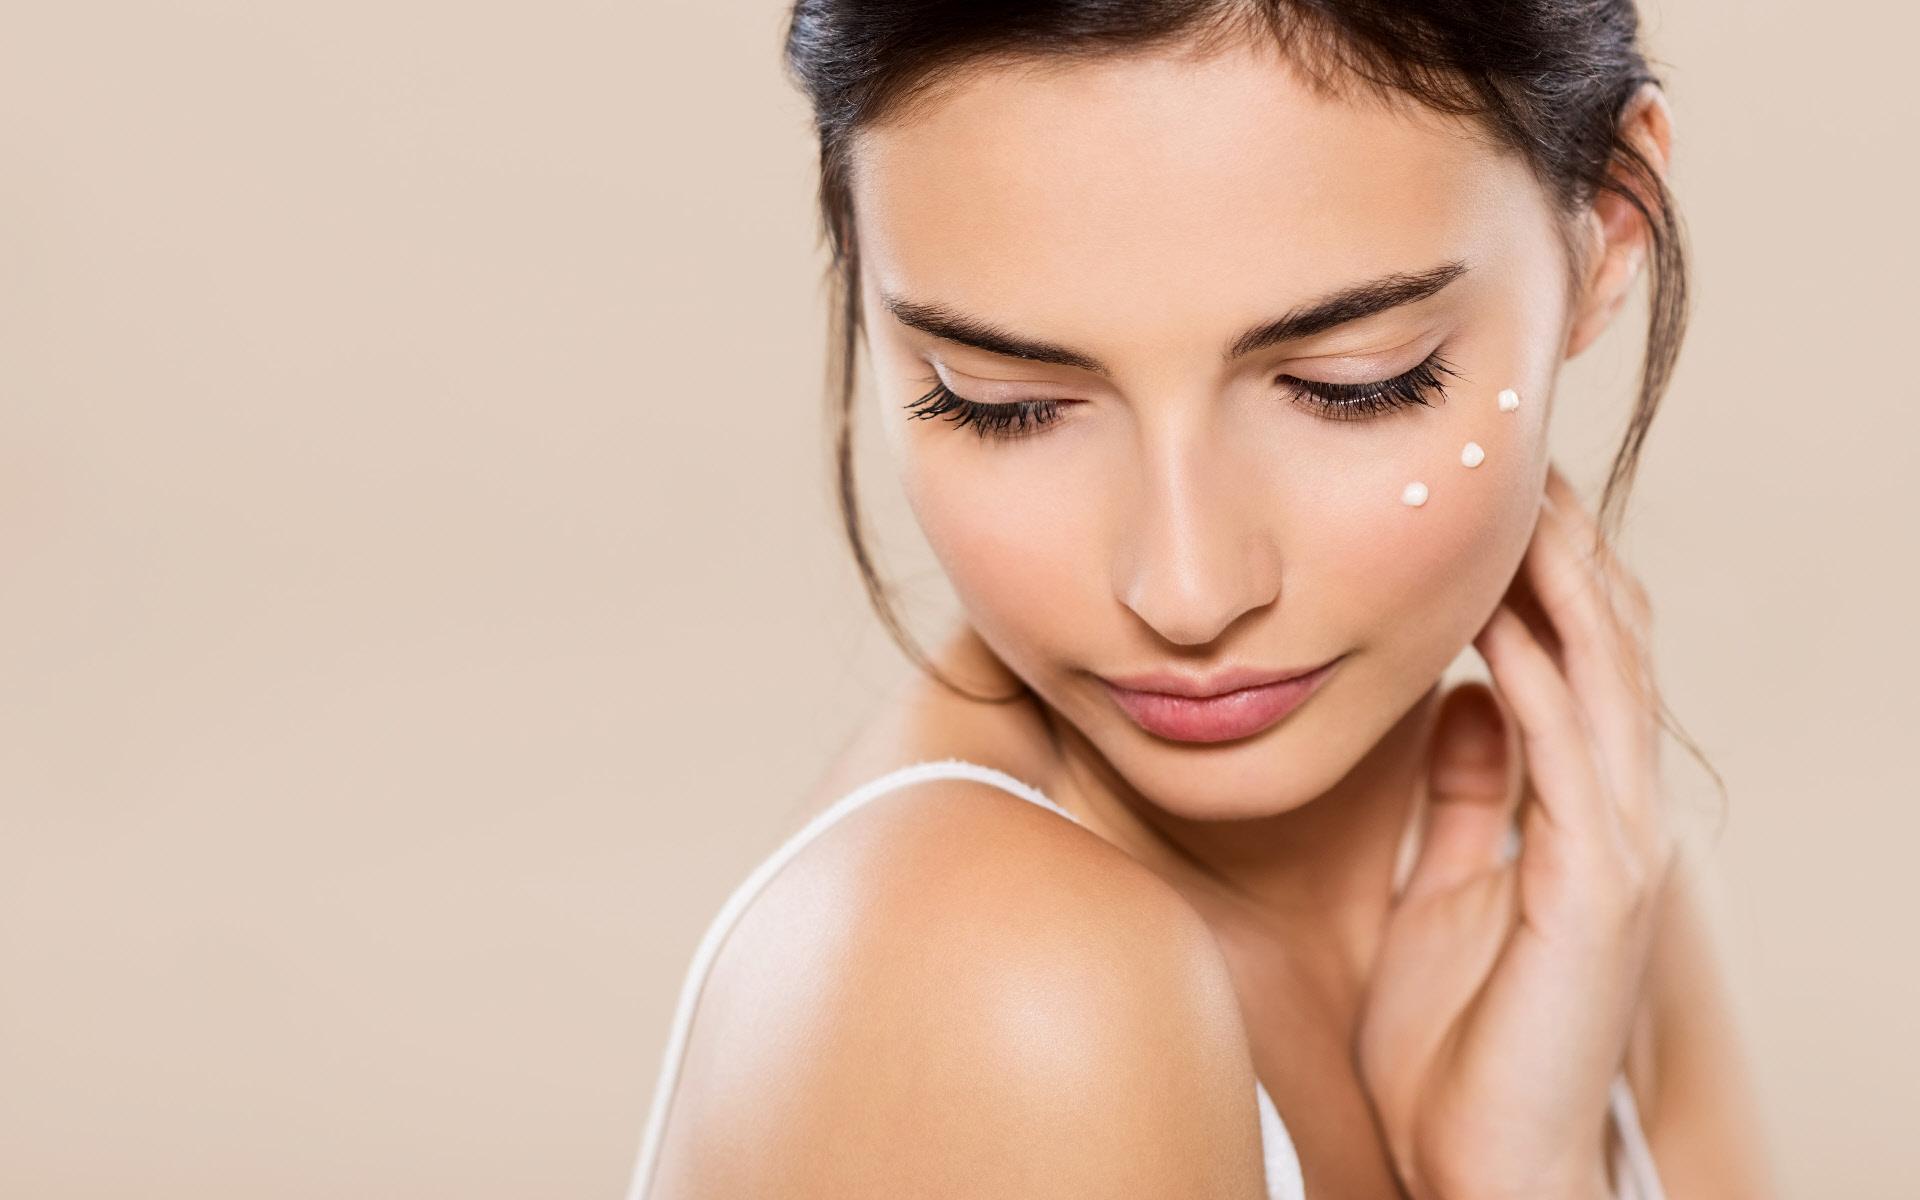 Ultra Beauty Salon 250 Godstone Road Whyteleafe Cr3 0ef 01883818290 Skin Care Ultra Beauty Salon